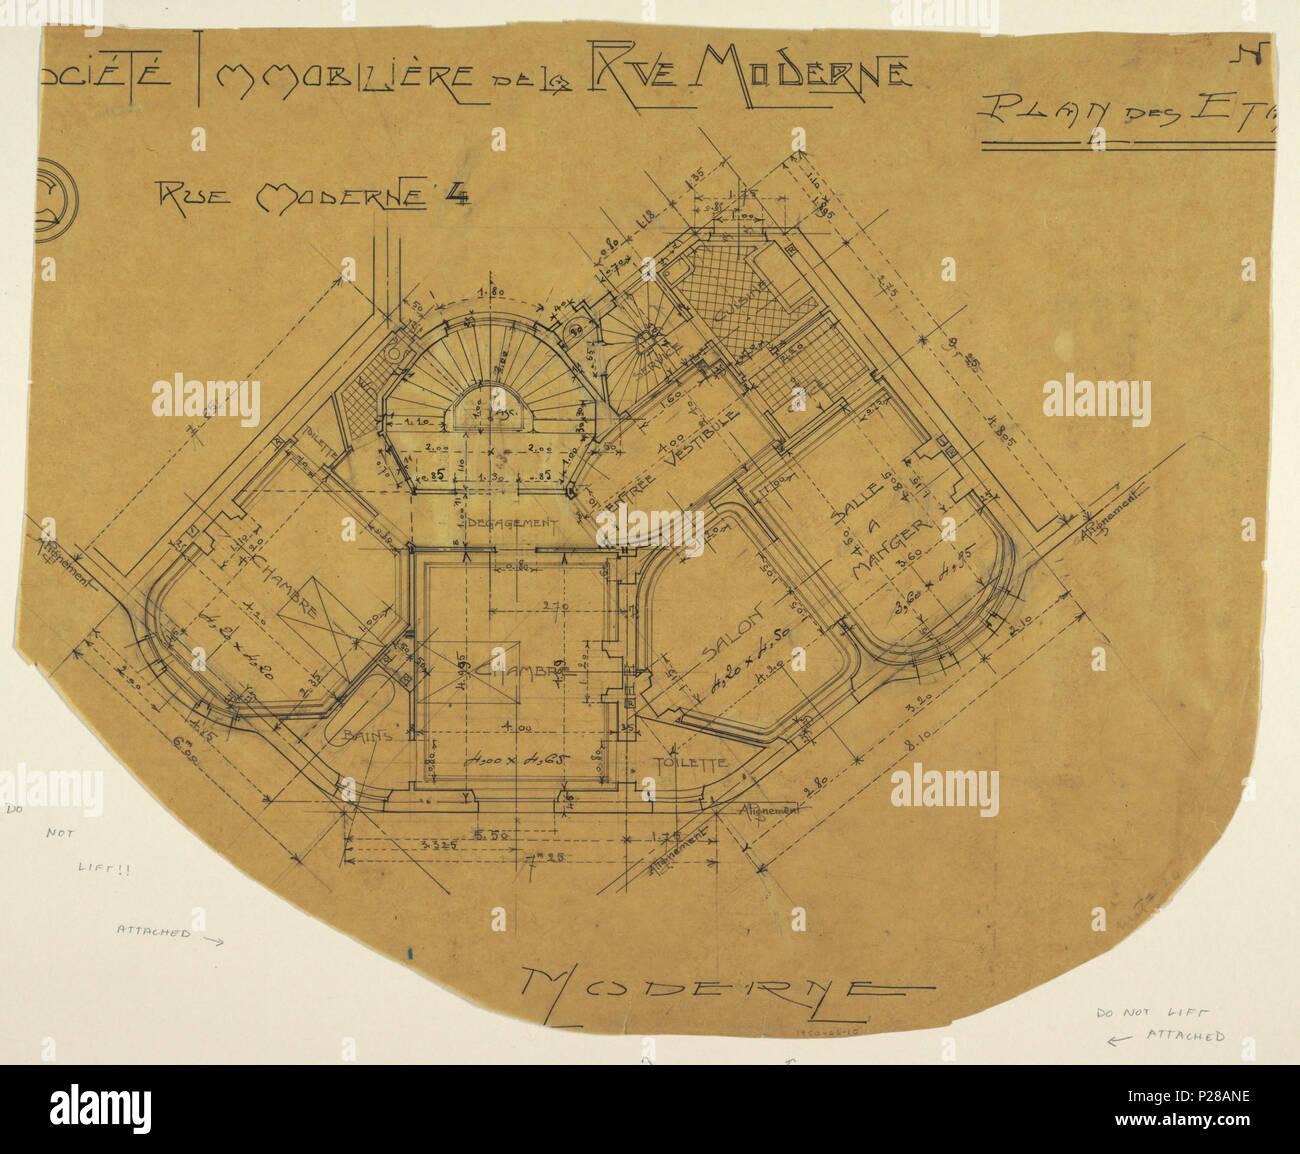 Scale Moderne Design.English Drawing Societe Immobliere De La Rue Moderne Plan